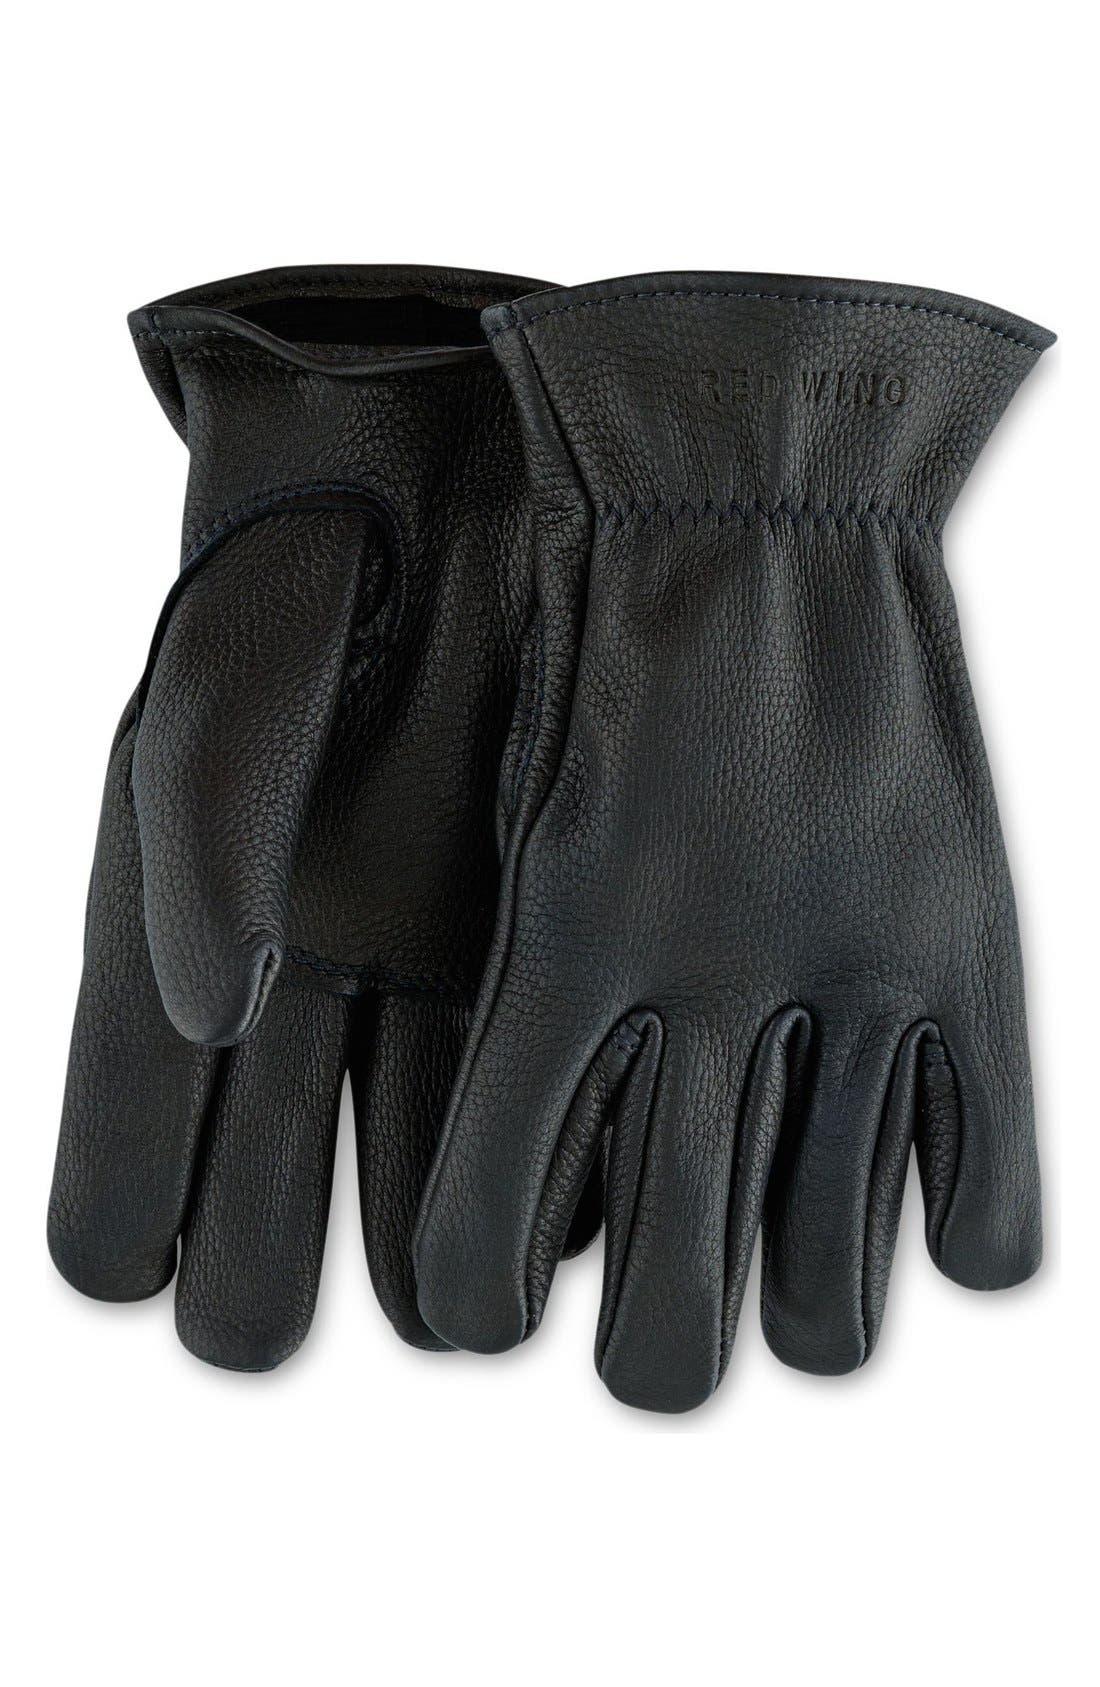 Buckskin Leather Gloves,                             Main thumbnail 1, color,